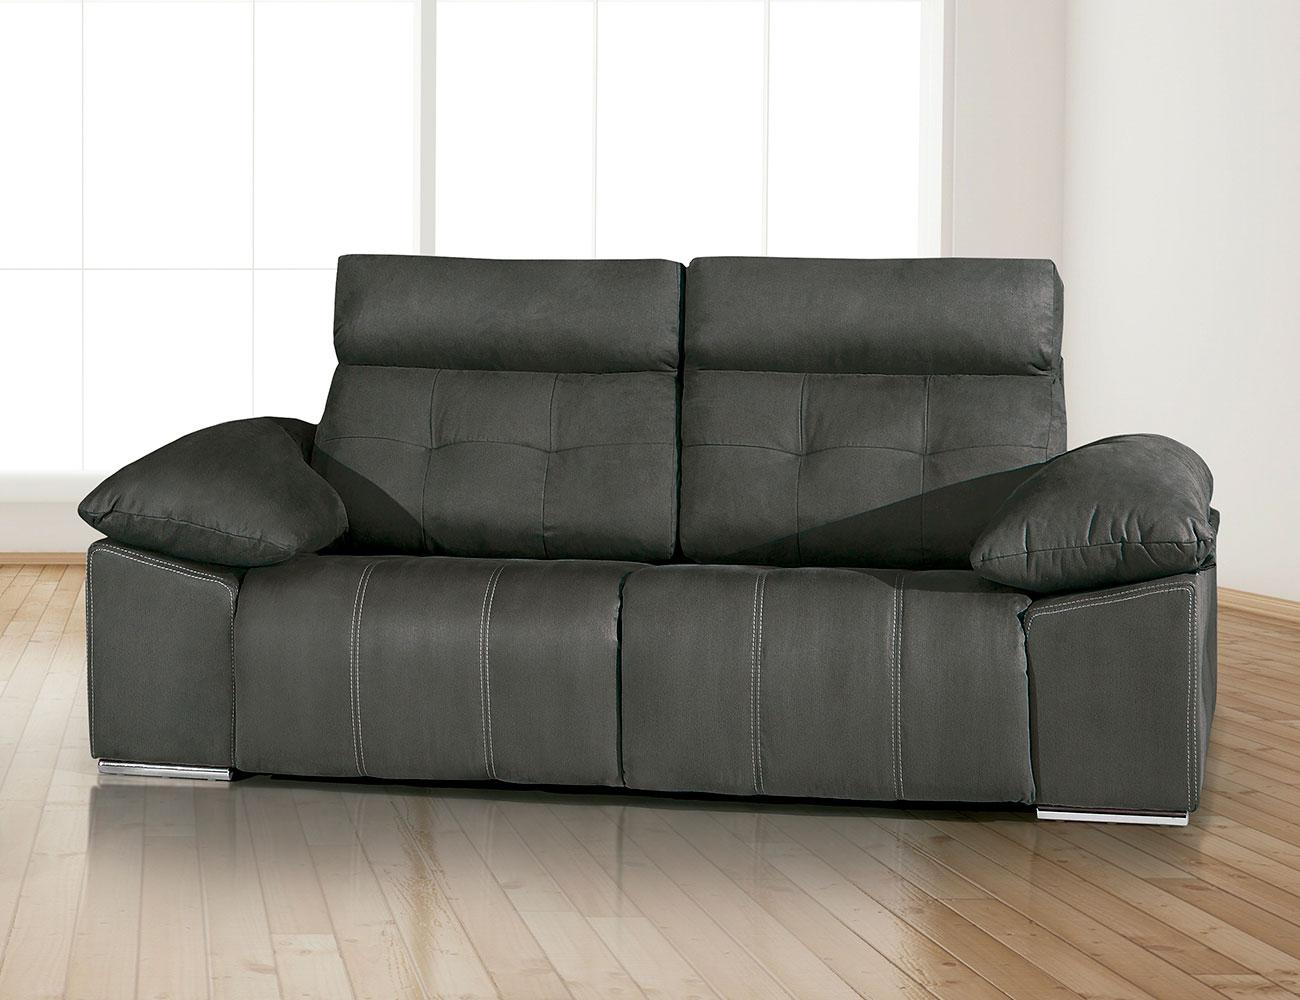 Sofa 3 plazas electrico tejido dante5